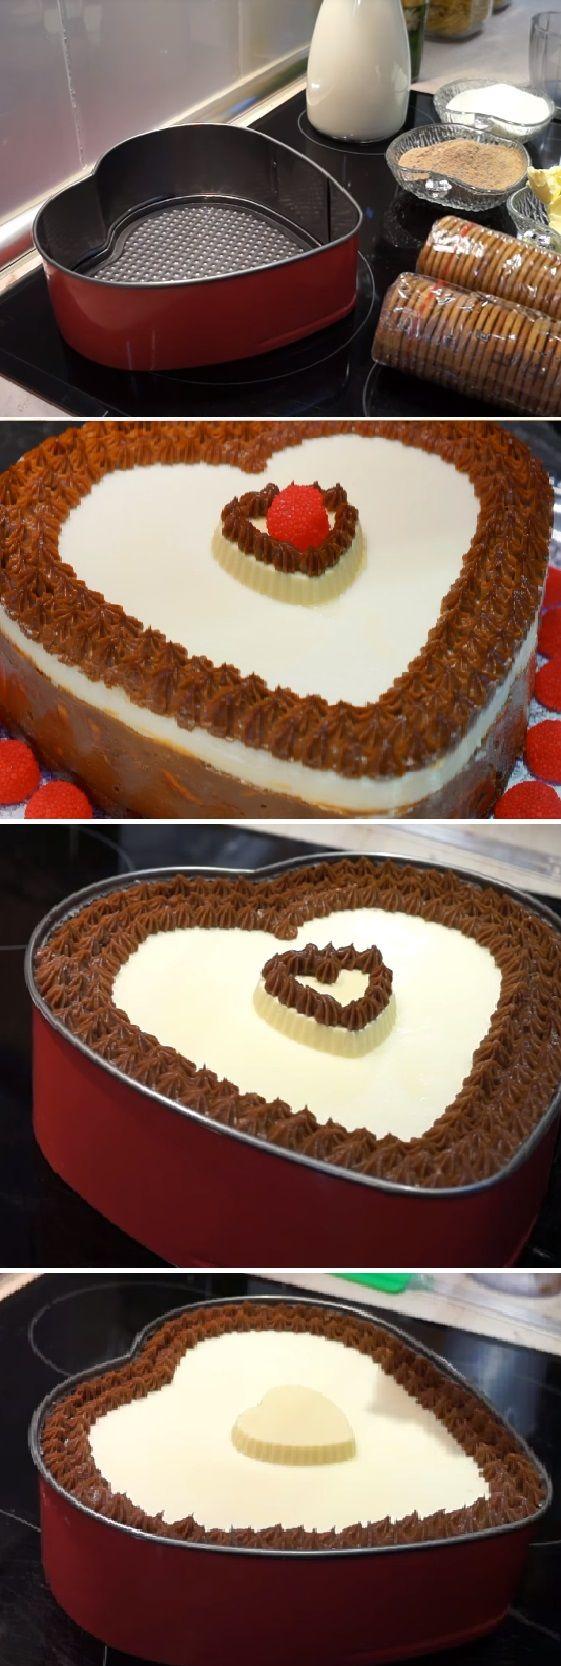 "Tarta de CHOCOLATE SAN VALENTÍN Economica ""Enamorados"" Recetas románticas¨  #sanvalentin #valentinesday #valentine #love #azúcar #tips #cupcakes #cakes #dulces #receta #recipe #casero #torta #tartas #pastel #nestlecocina #bizcocho #bizcochuelo #tasty #cocina #chocolate #pan #panes Si te gusta dinos HOLA y dale a Me Gusta MIREN …"